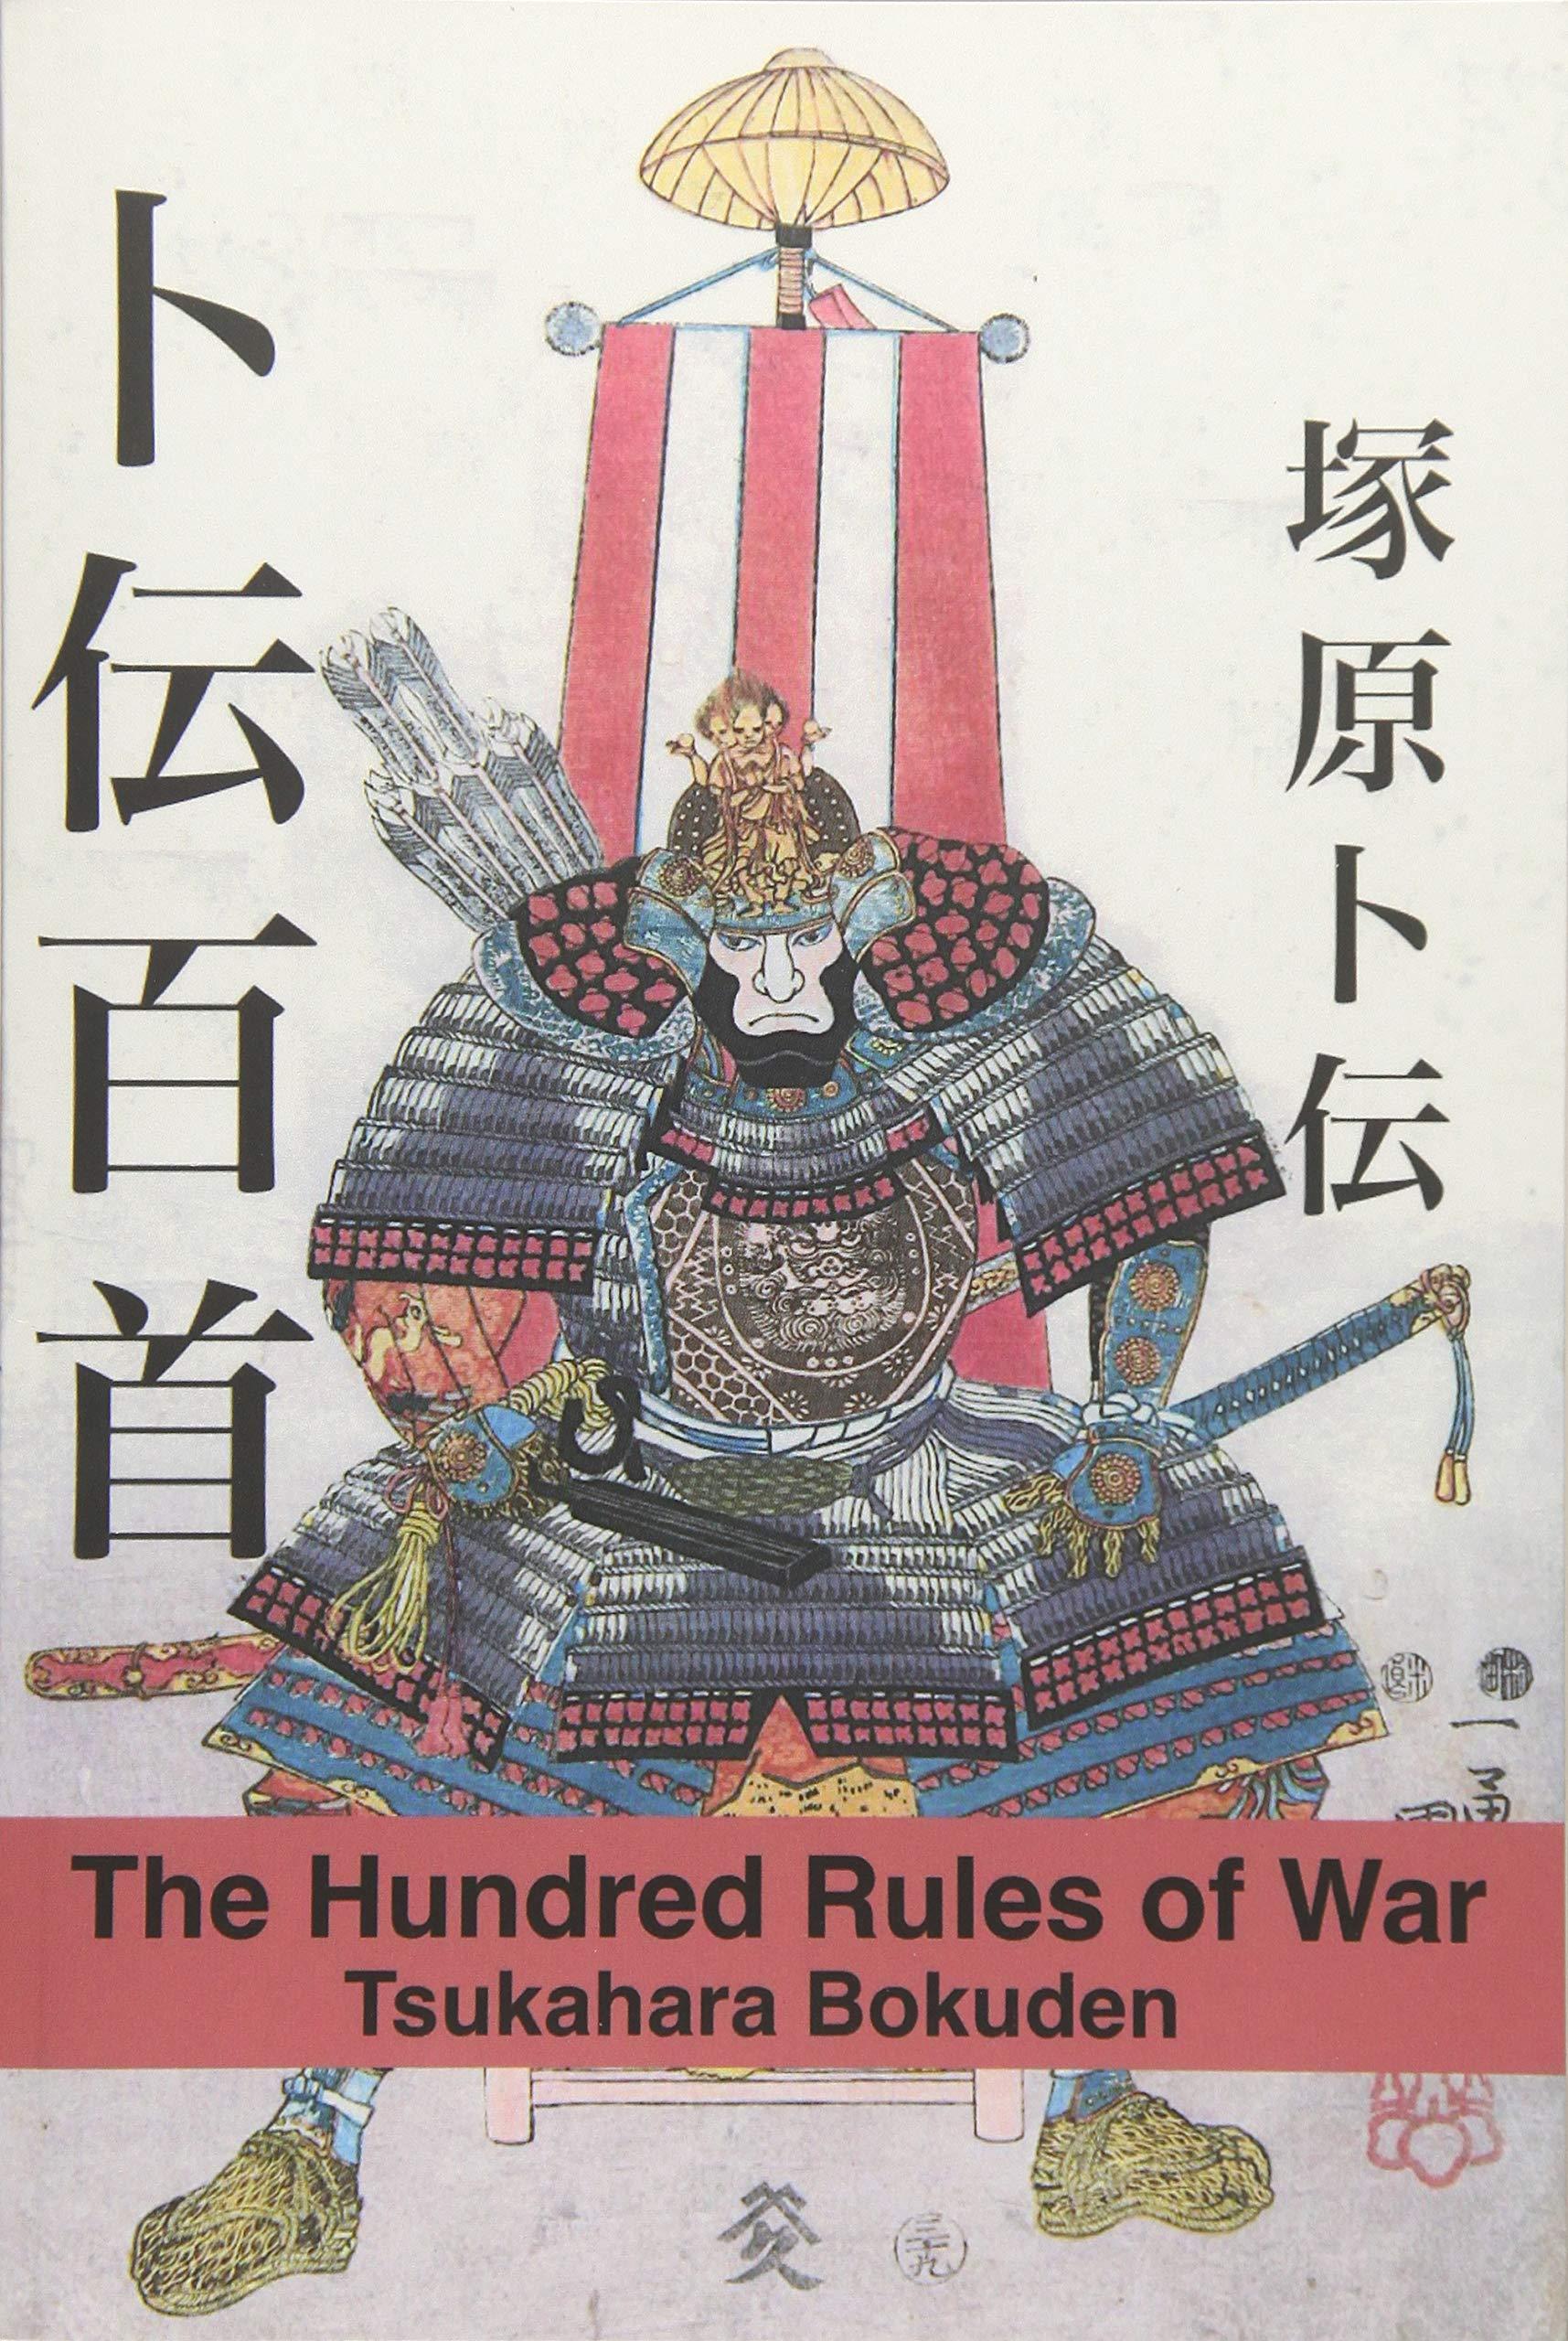 The Hundred Rules of War: Tsukahara Bokuden, eric shahan ...